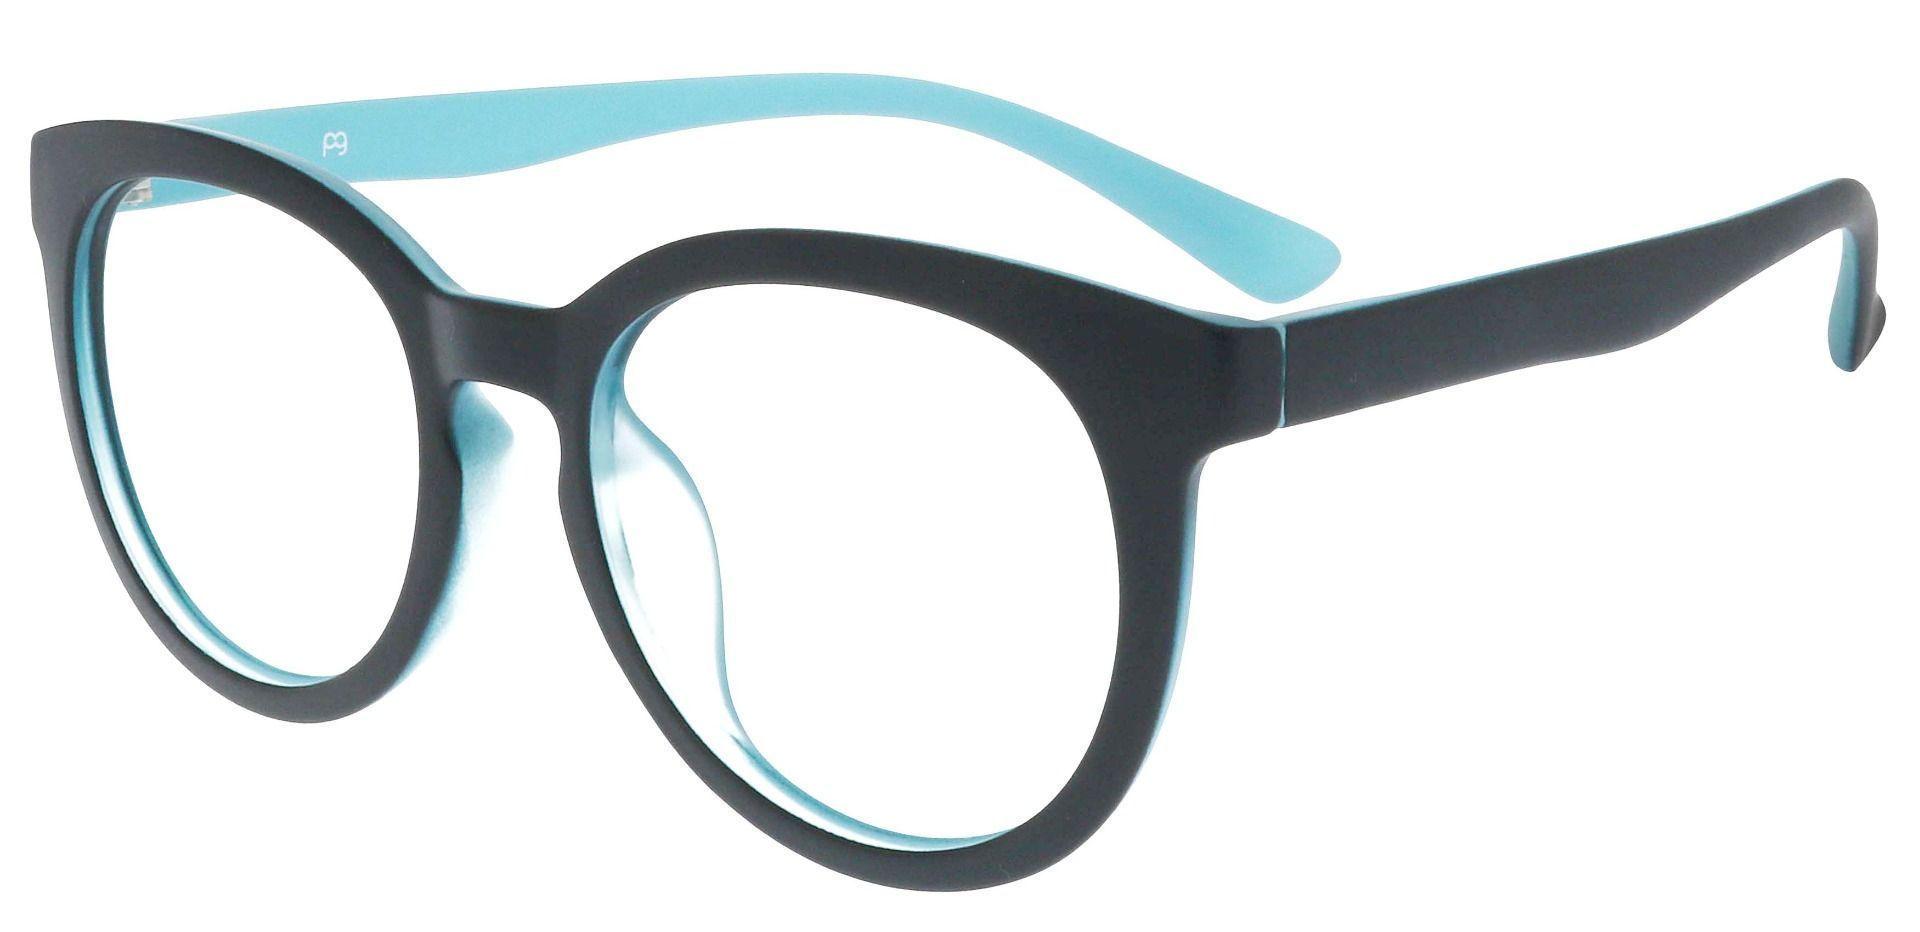 Dudley Oval Prescription Glasses - Black